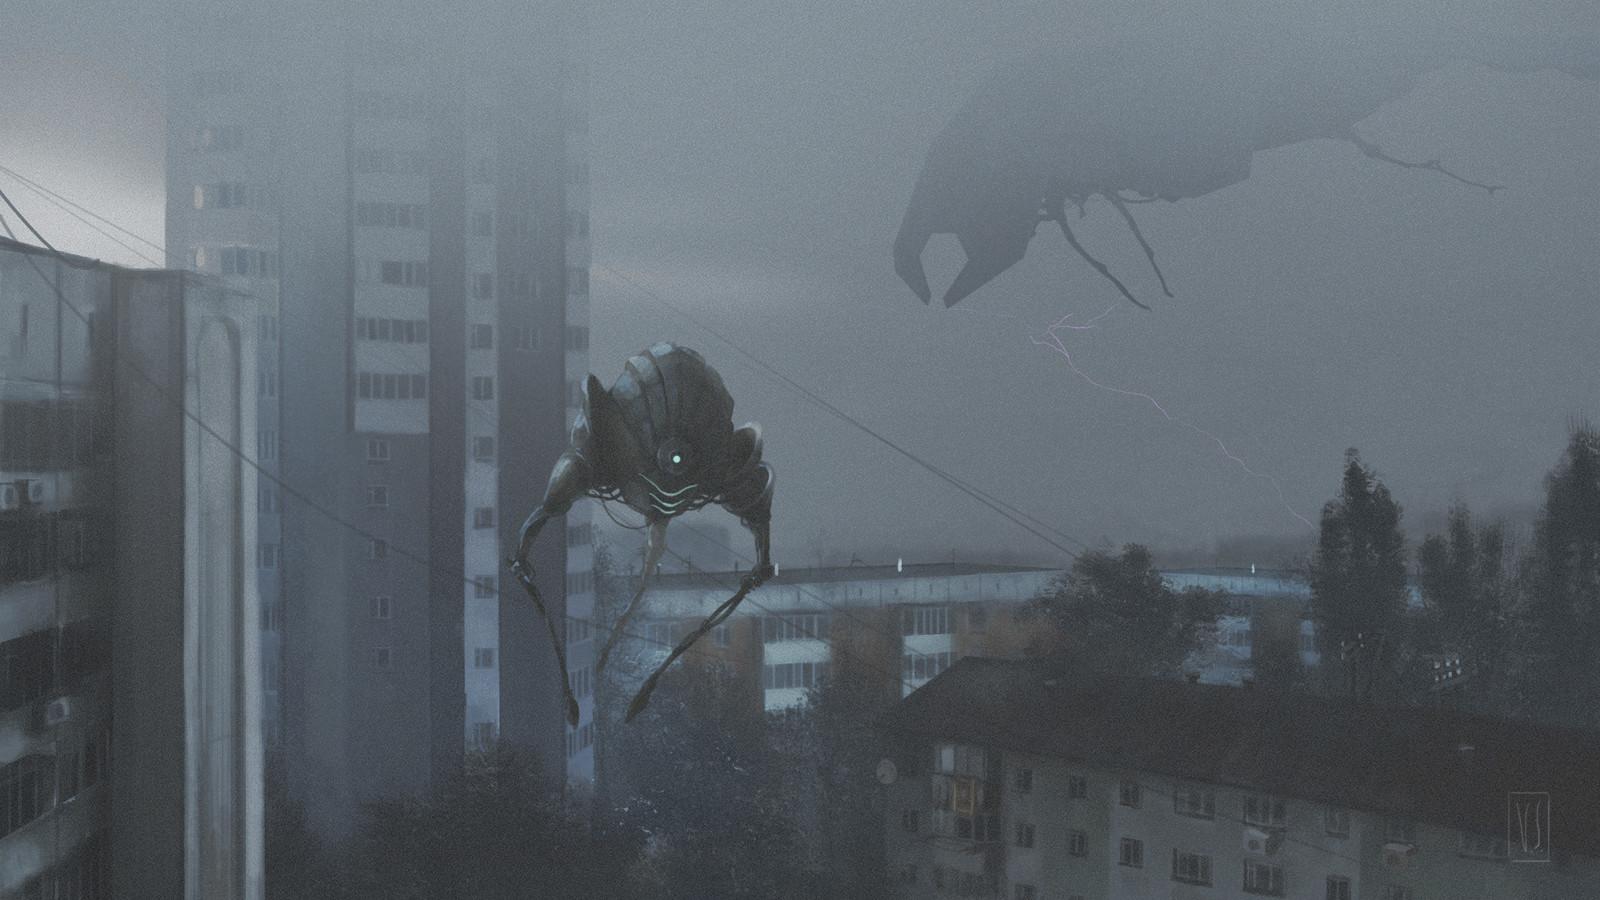 Balconies (Tribute to Half-Life)